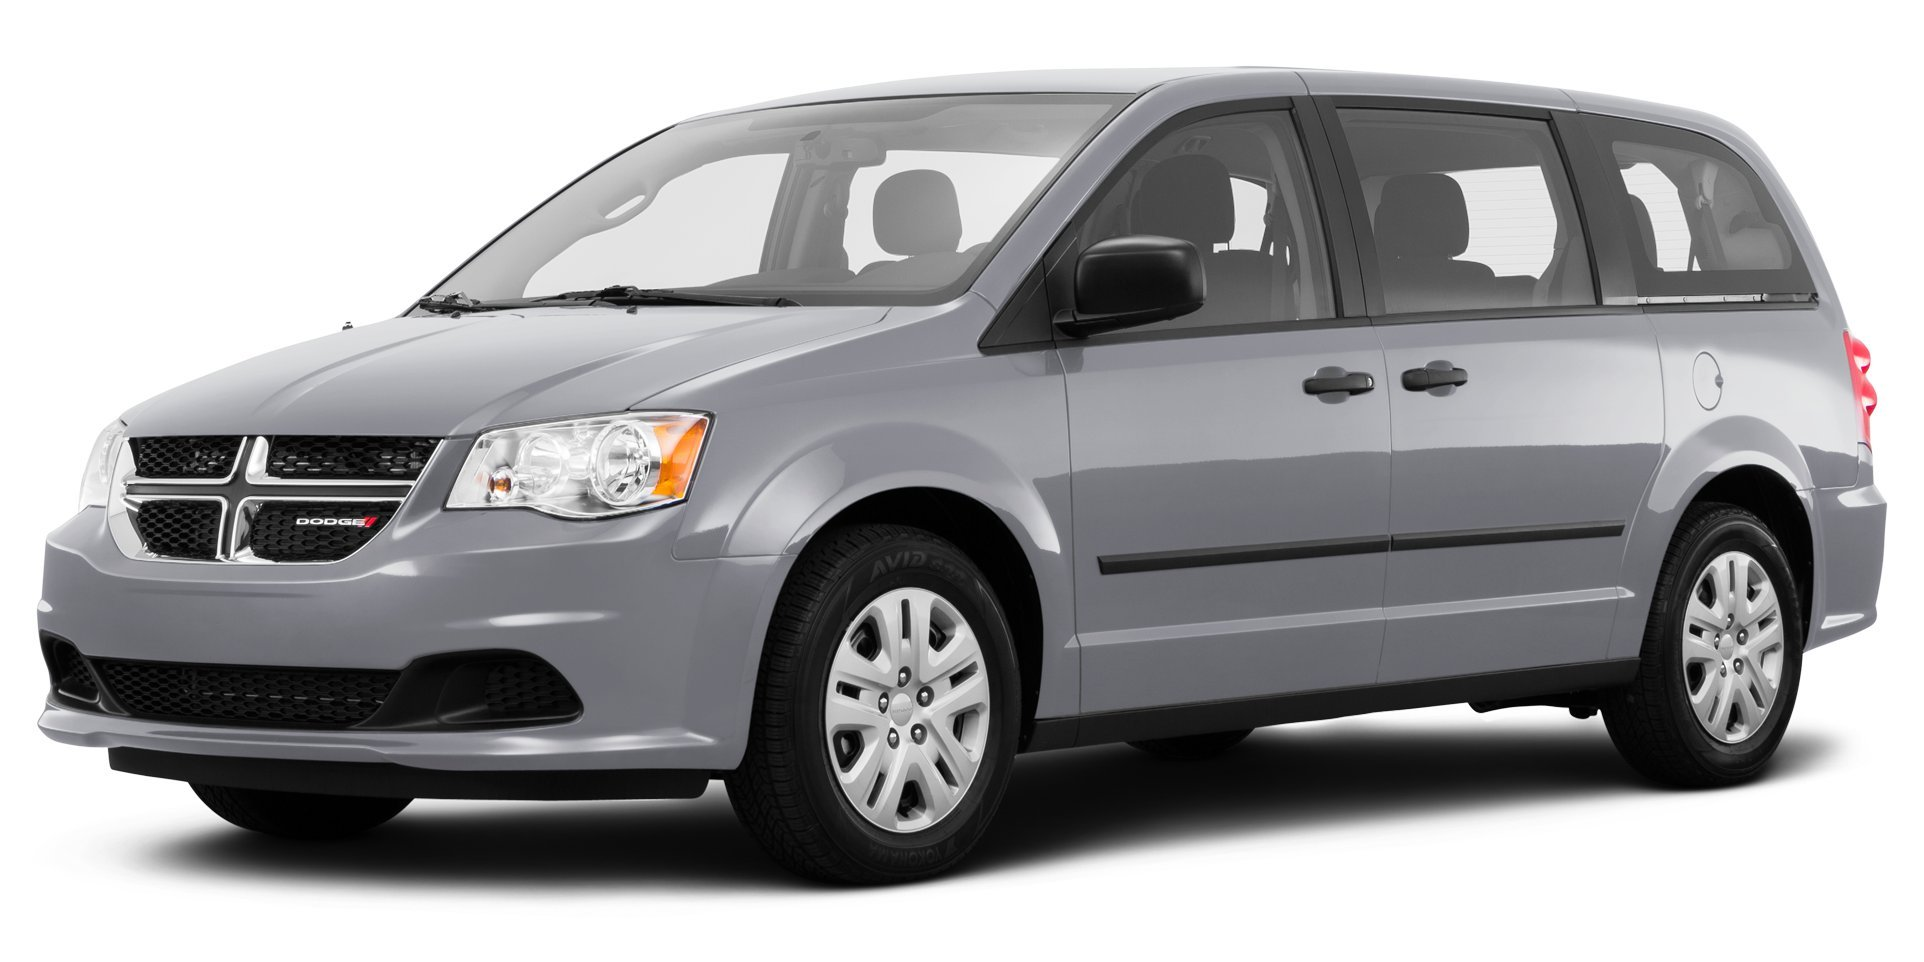 2016 dodge grand caravan reviews images and specs vehicles. Black Bedroom Furniture Sets. Home Design Ideas